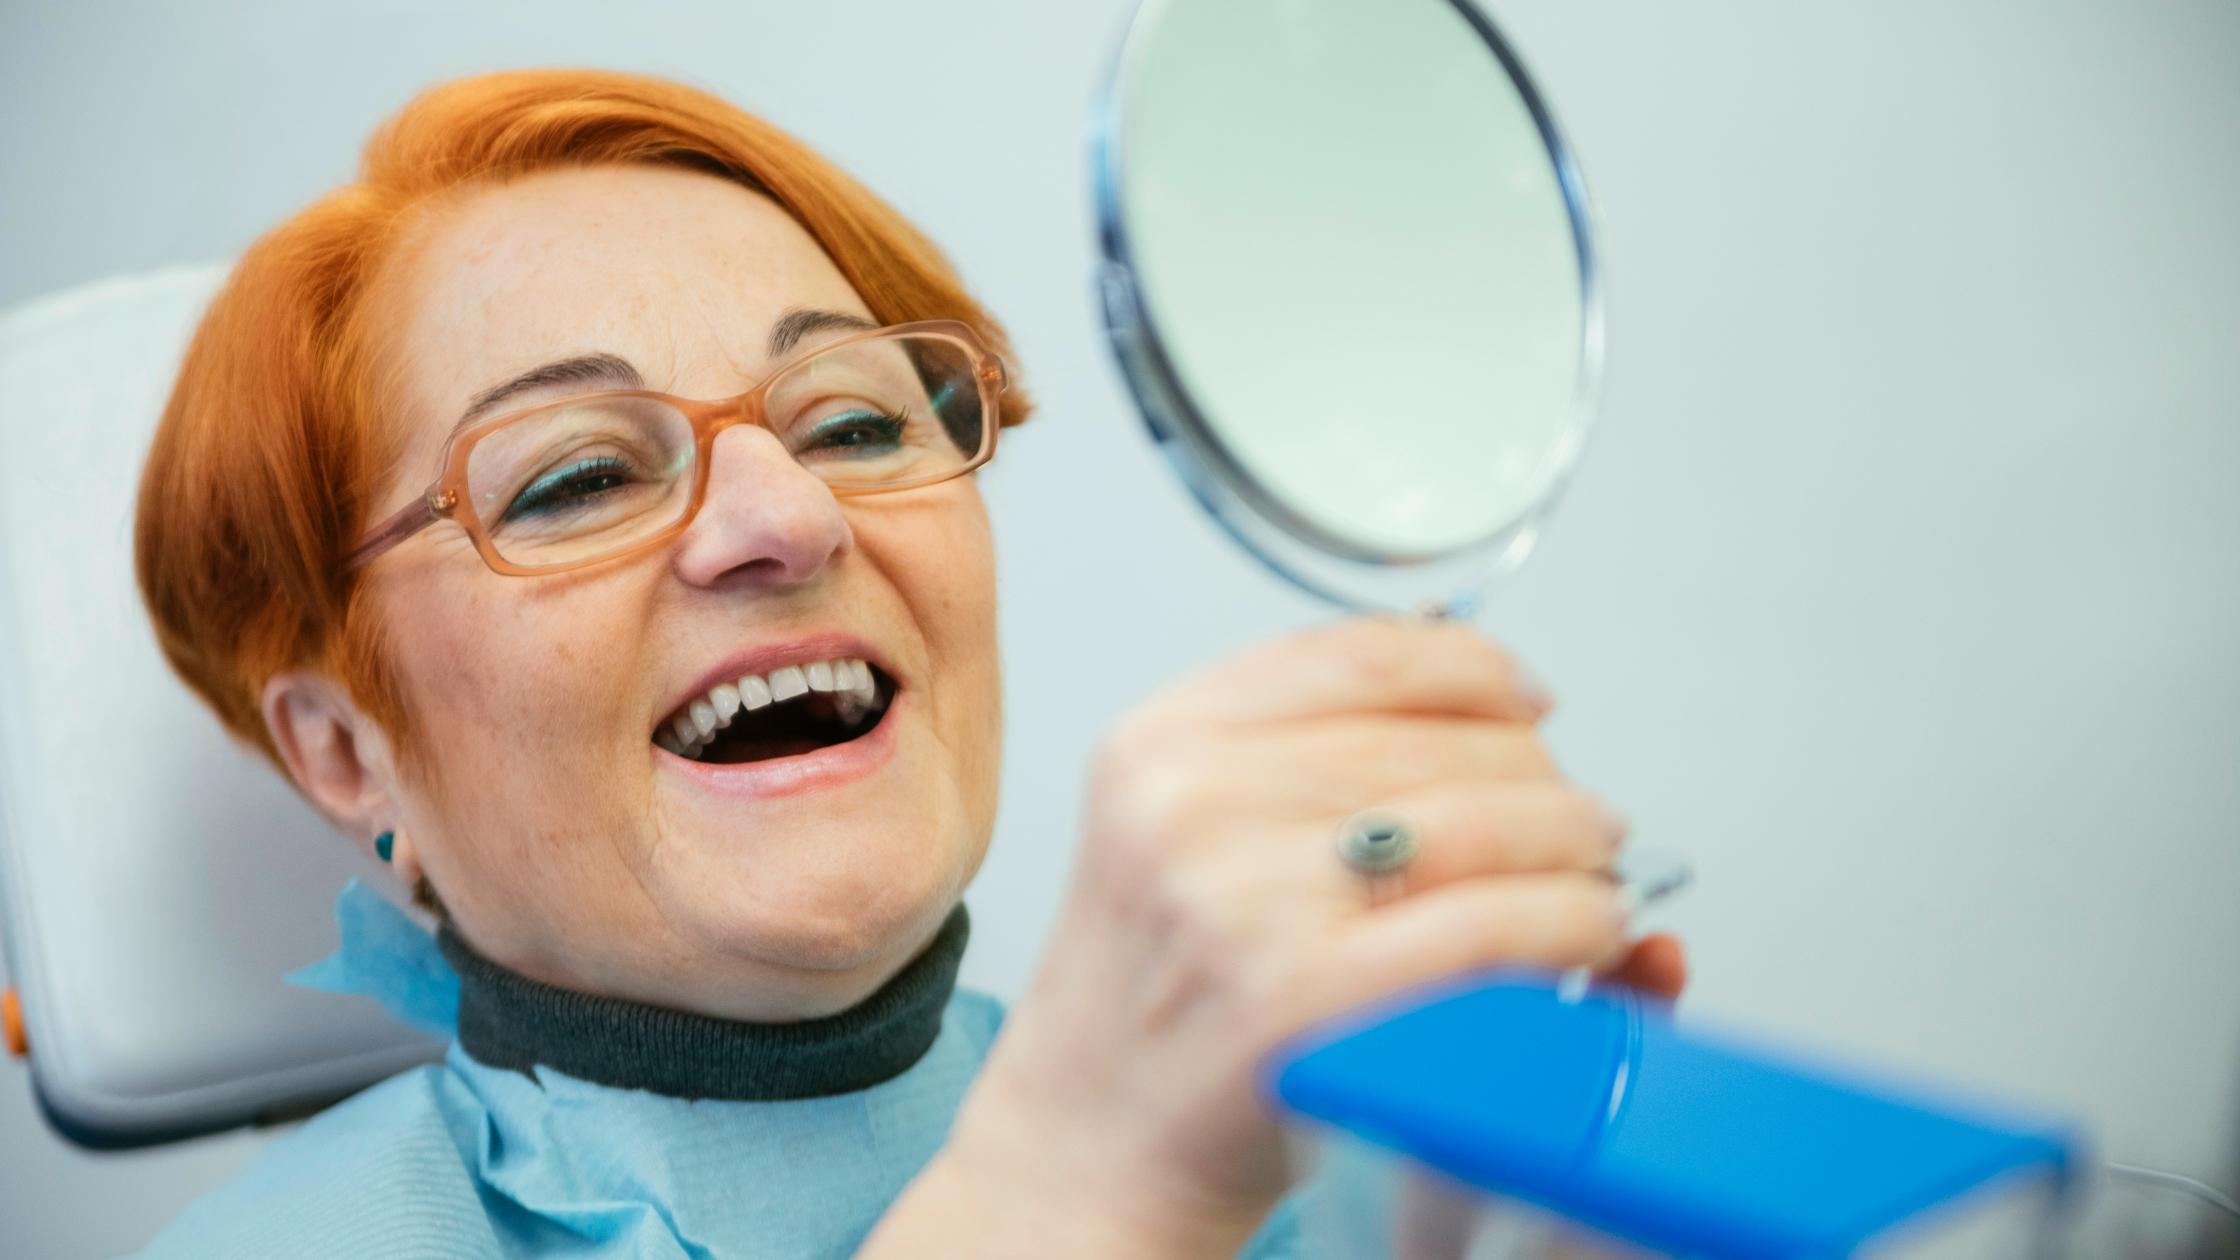 dentures, denture mold, oral health, health insurance, dental insurance, dental health